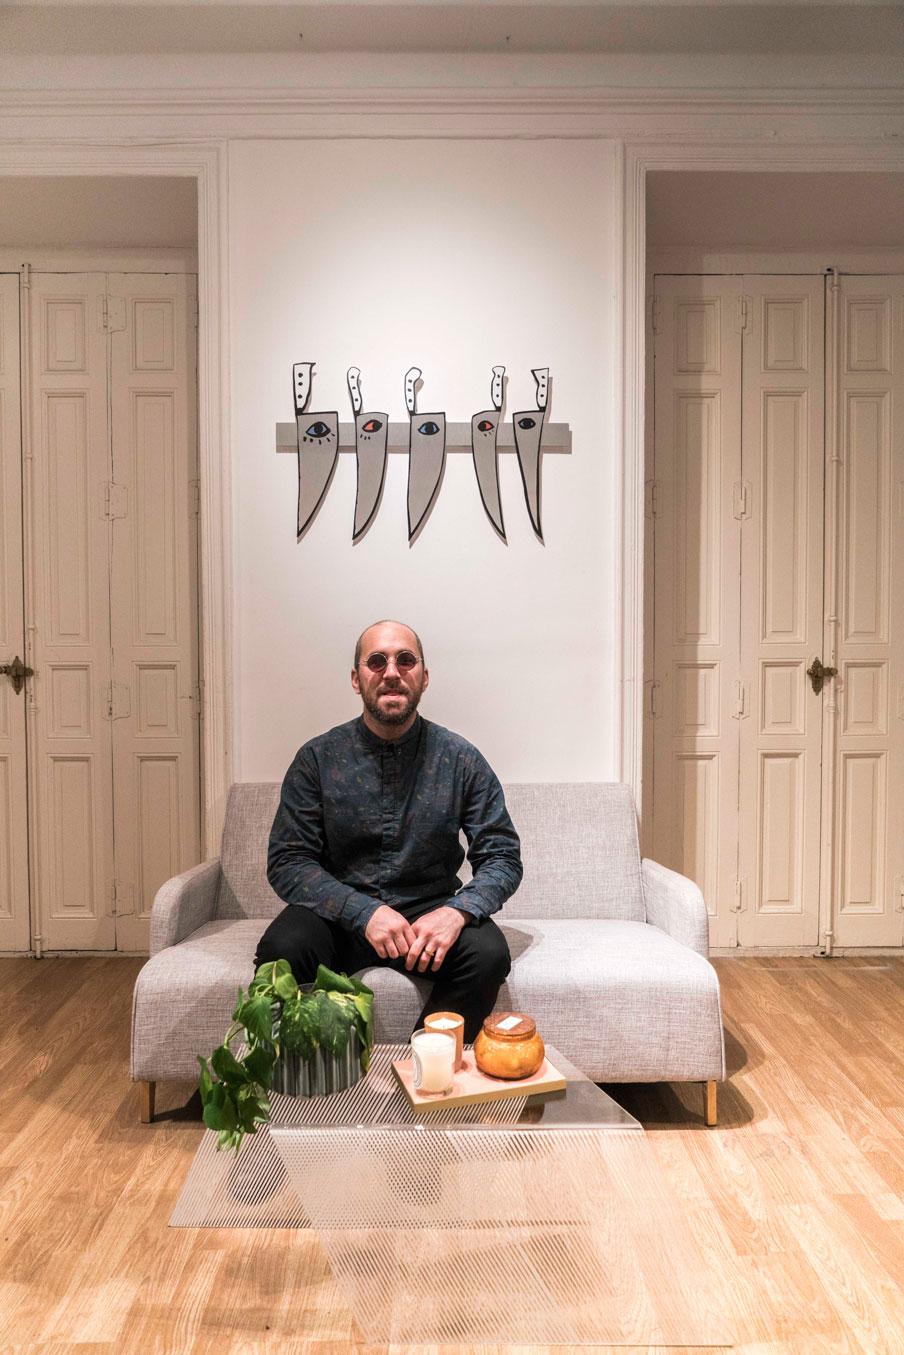 luigi-cuchillo-knife-bandeja-06.jpg